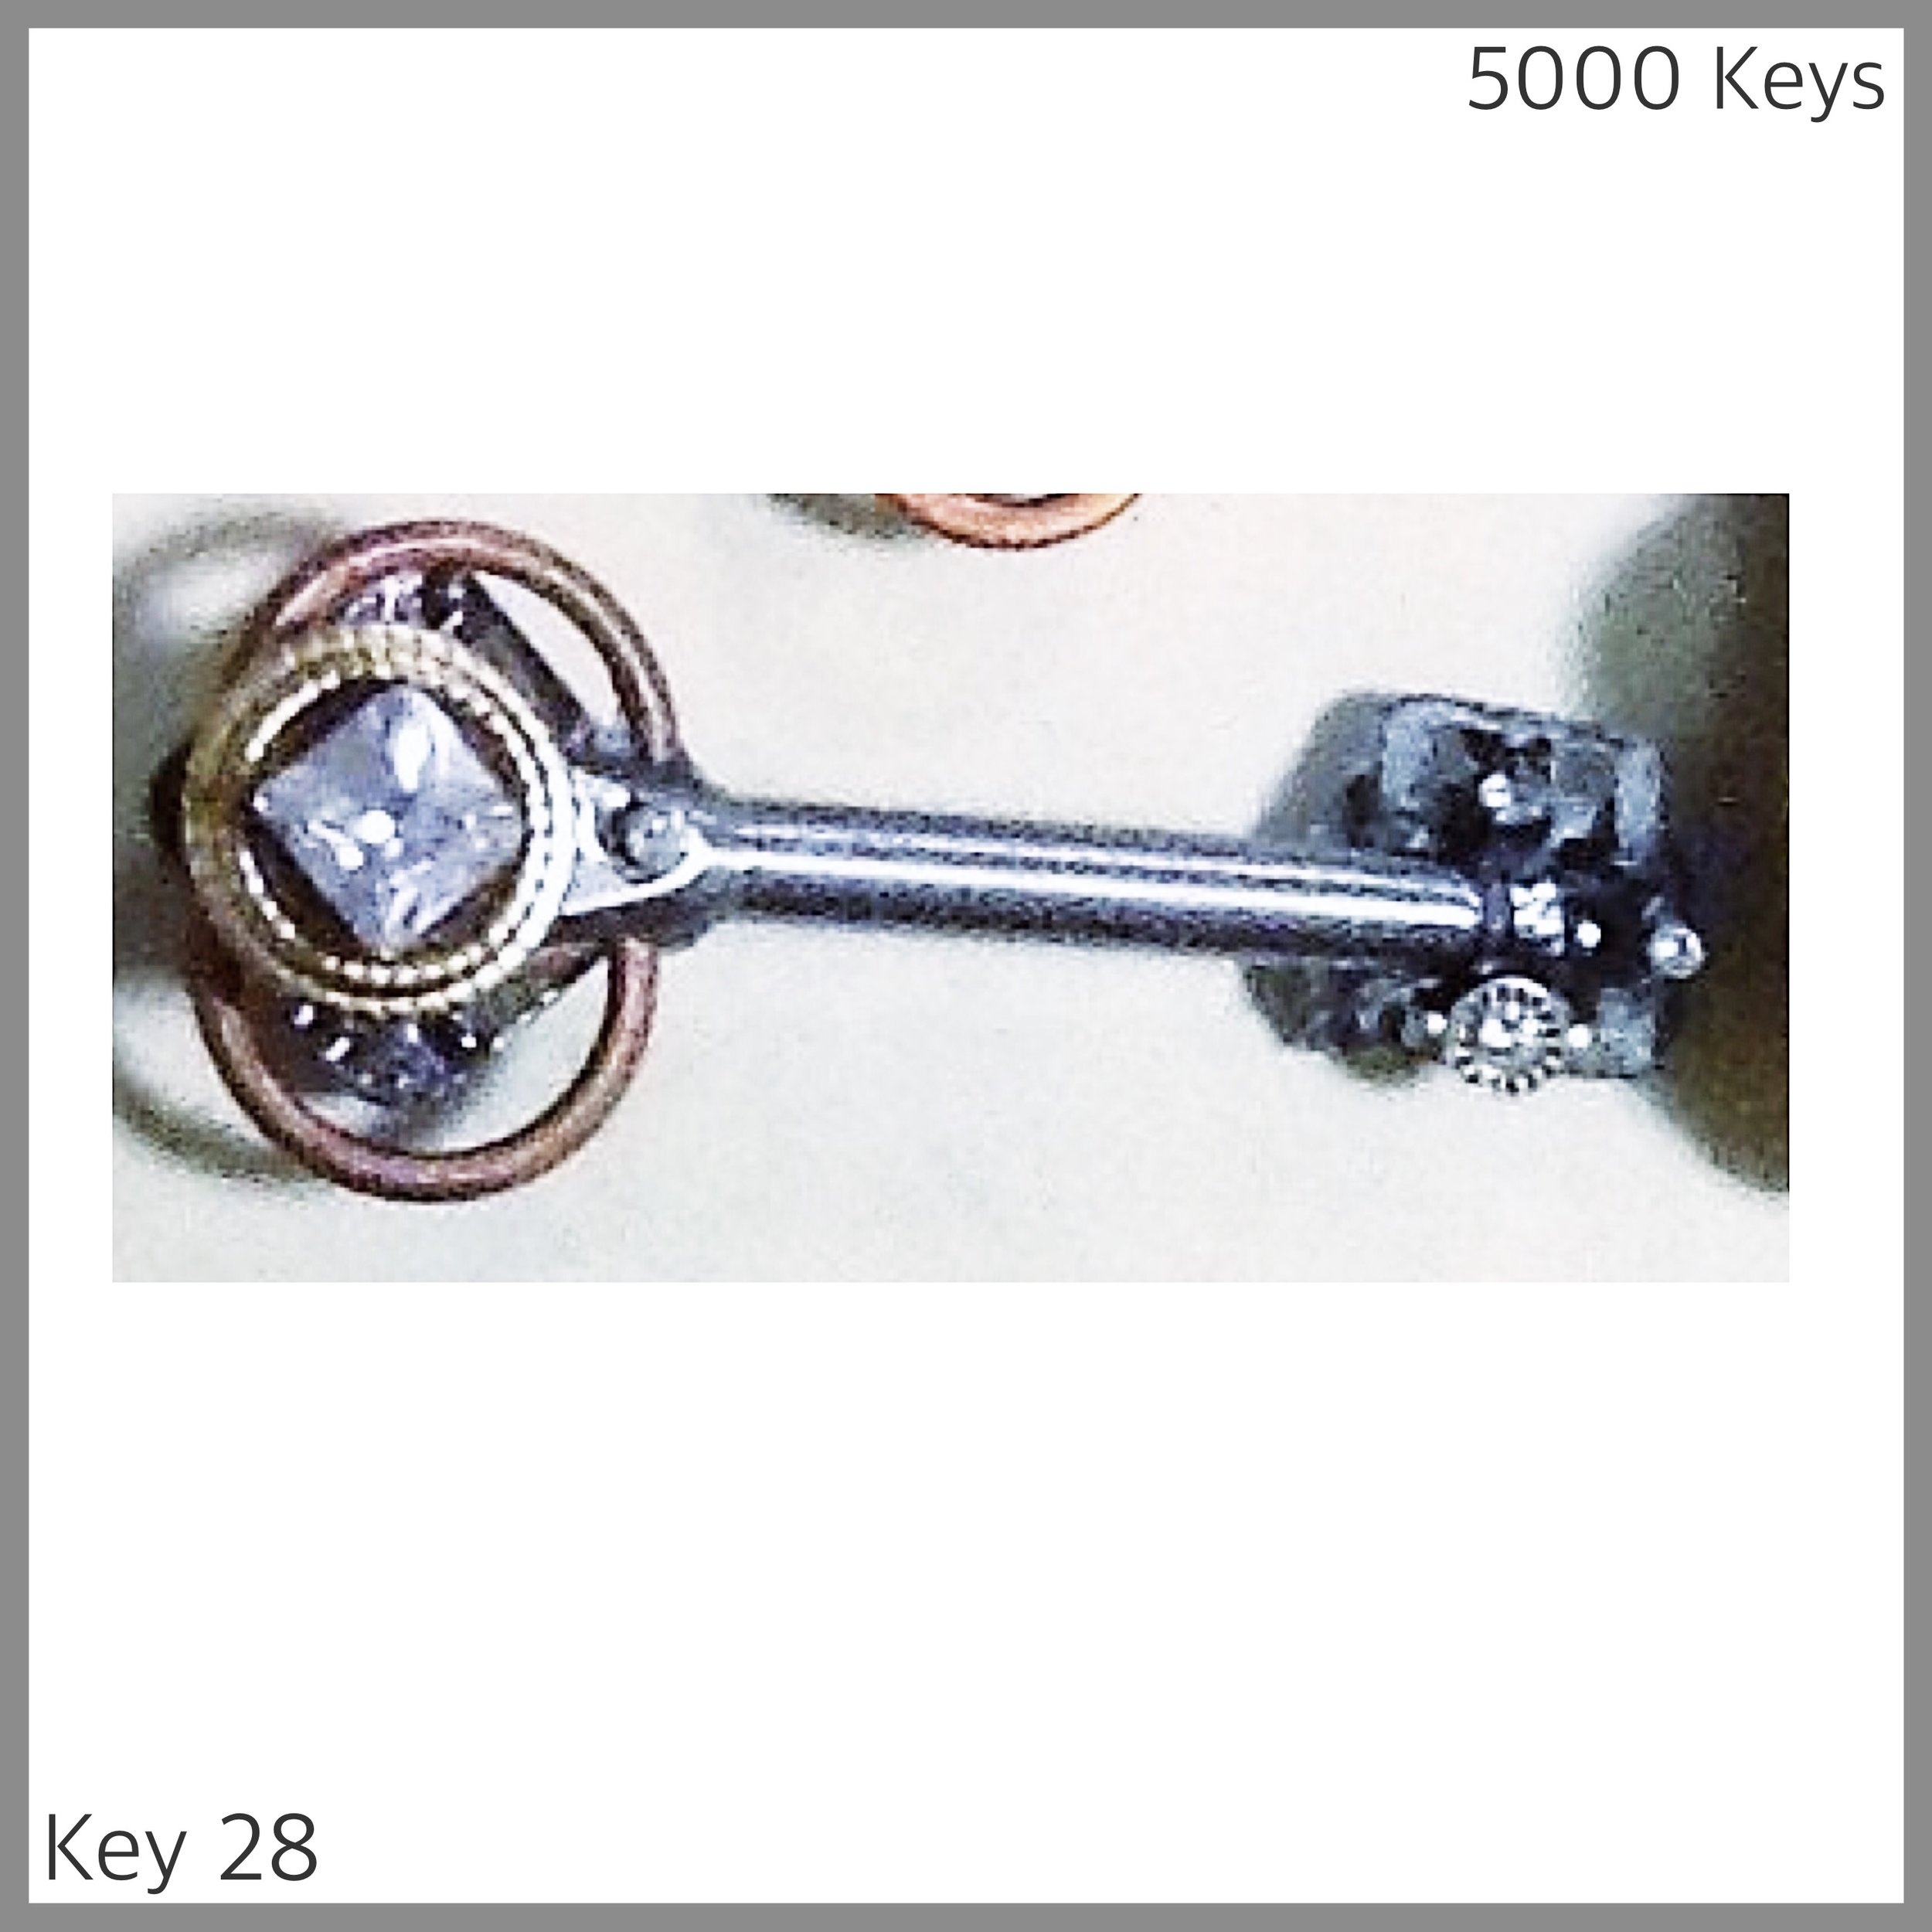 Key 28.jpg